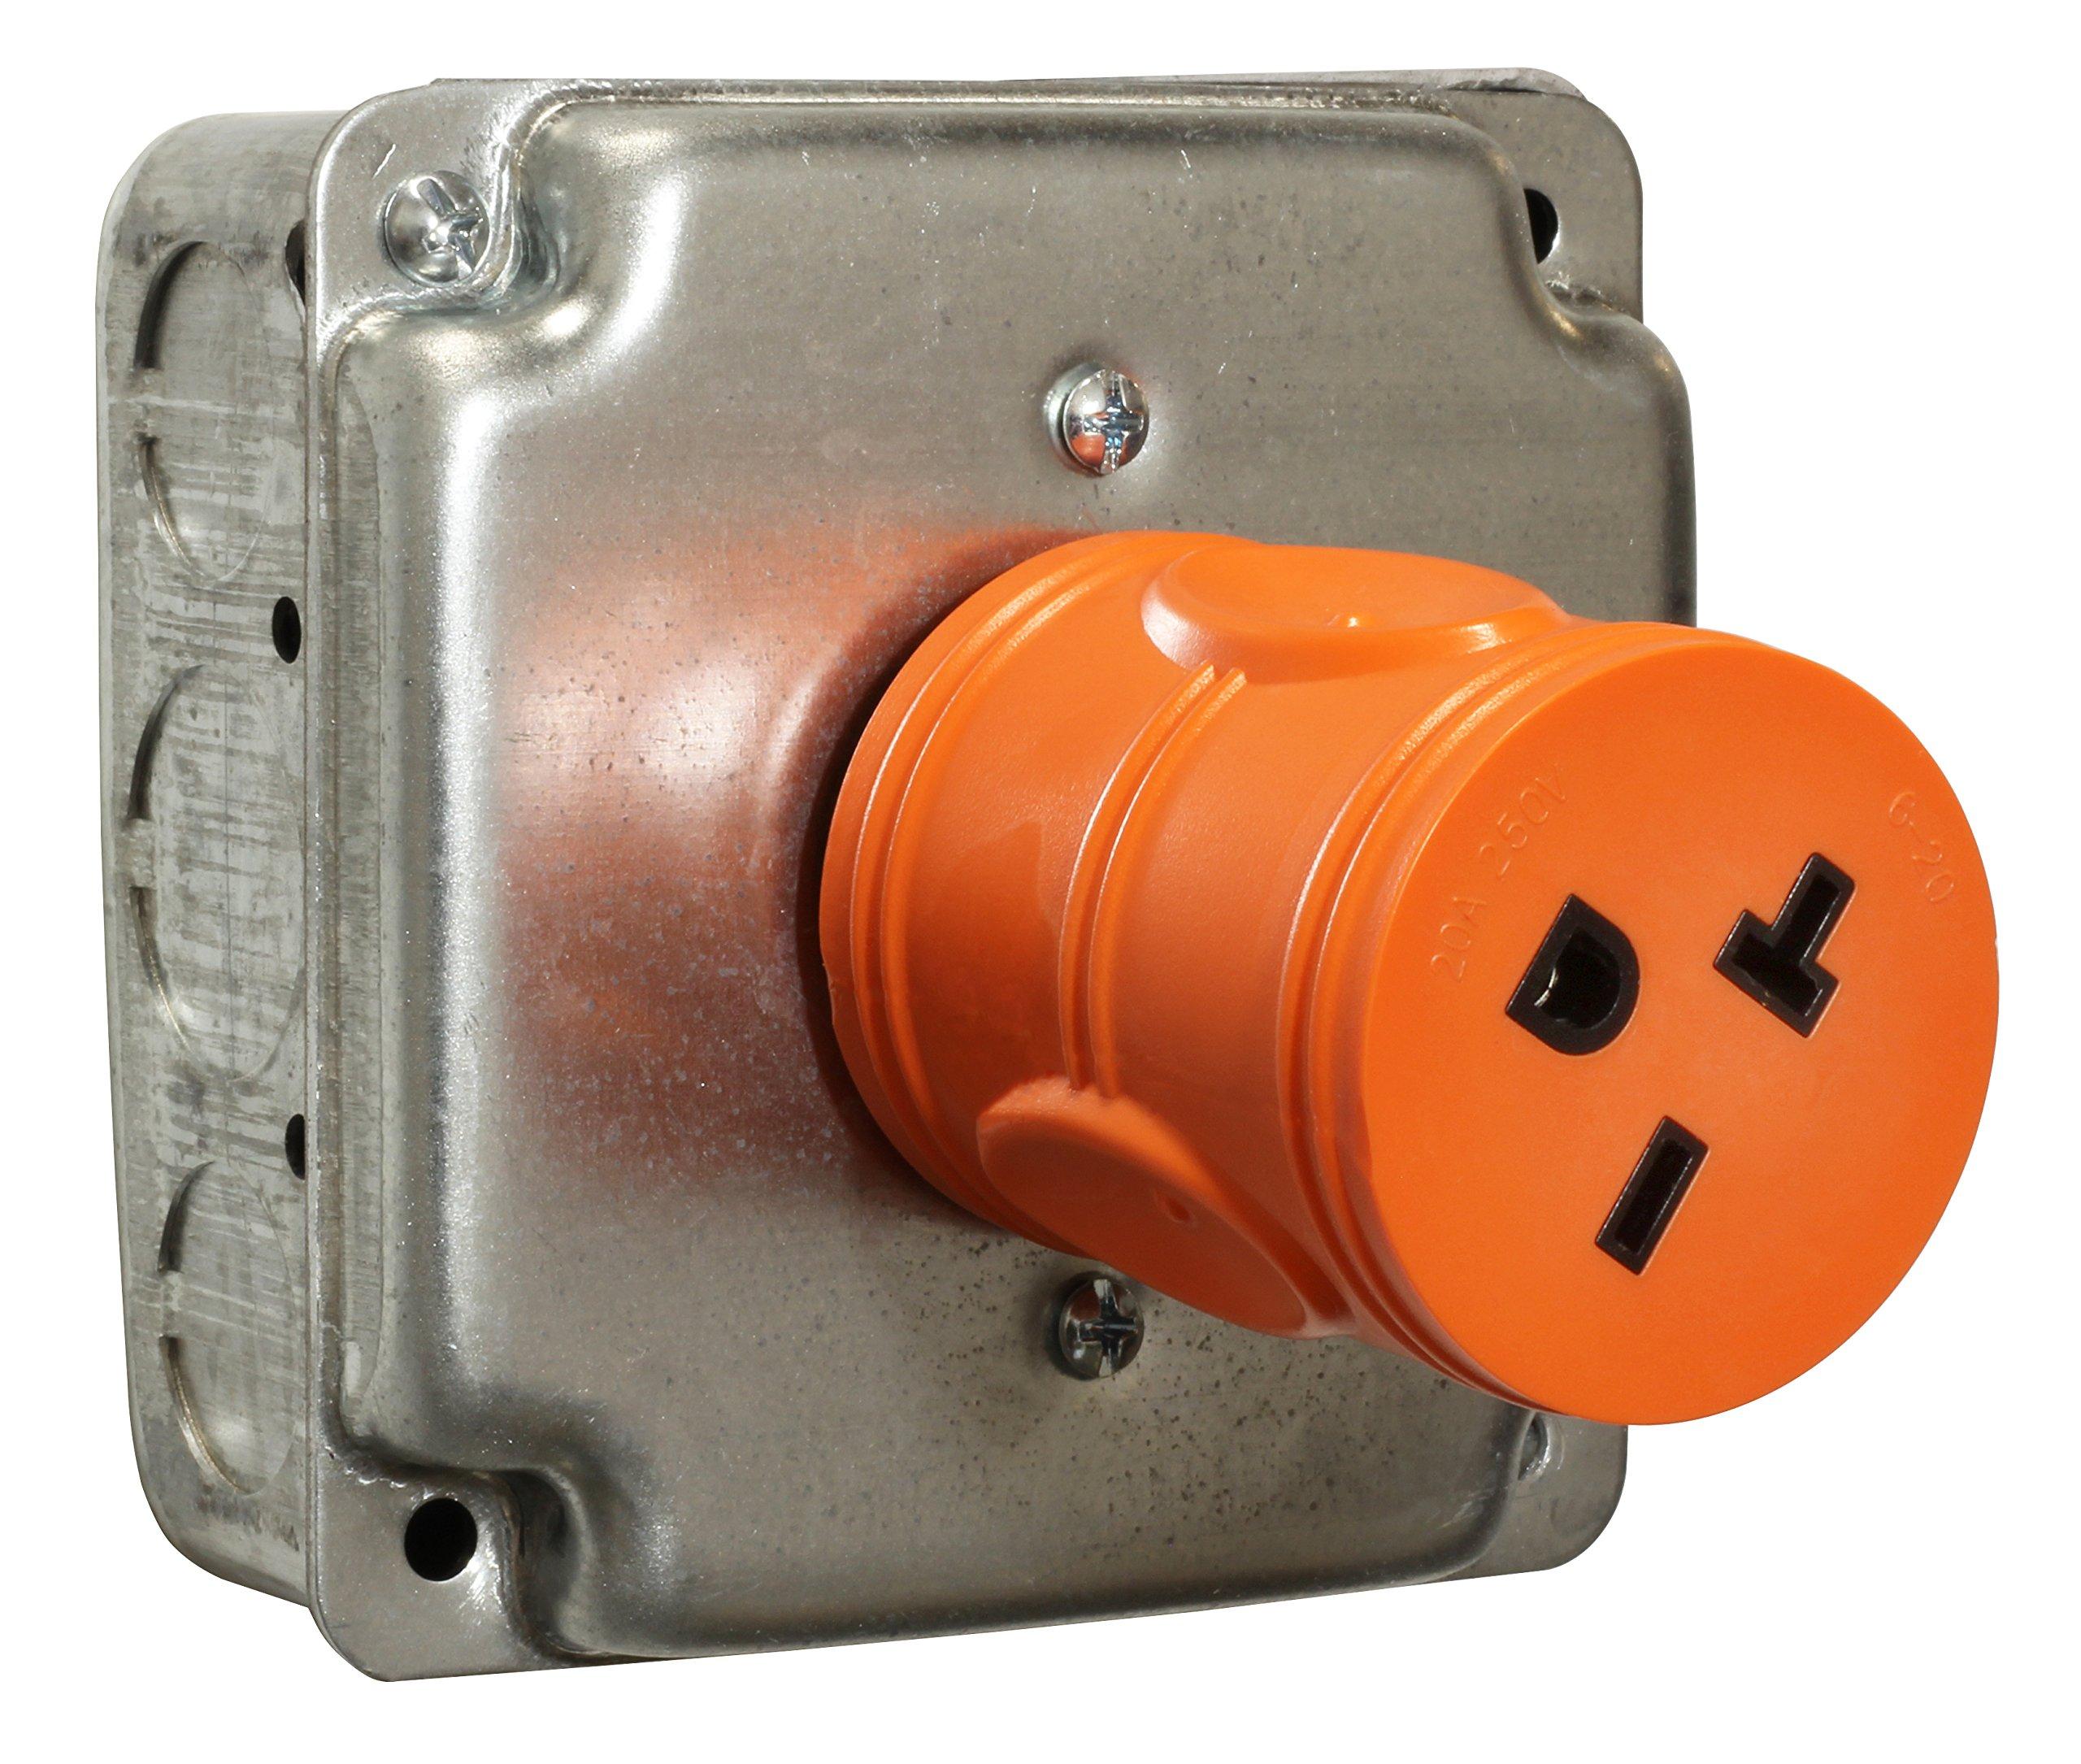 AC WORKS [ADL620620] NEMA L6-20P 20Amp 250Volt Locking Plug to NEMA 6-15/20R 15/20Amp 250Volt Female Connector Adapter by AC WORKS (Image #5)